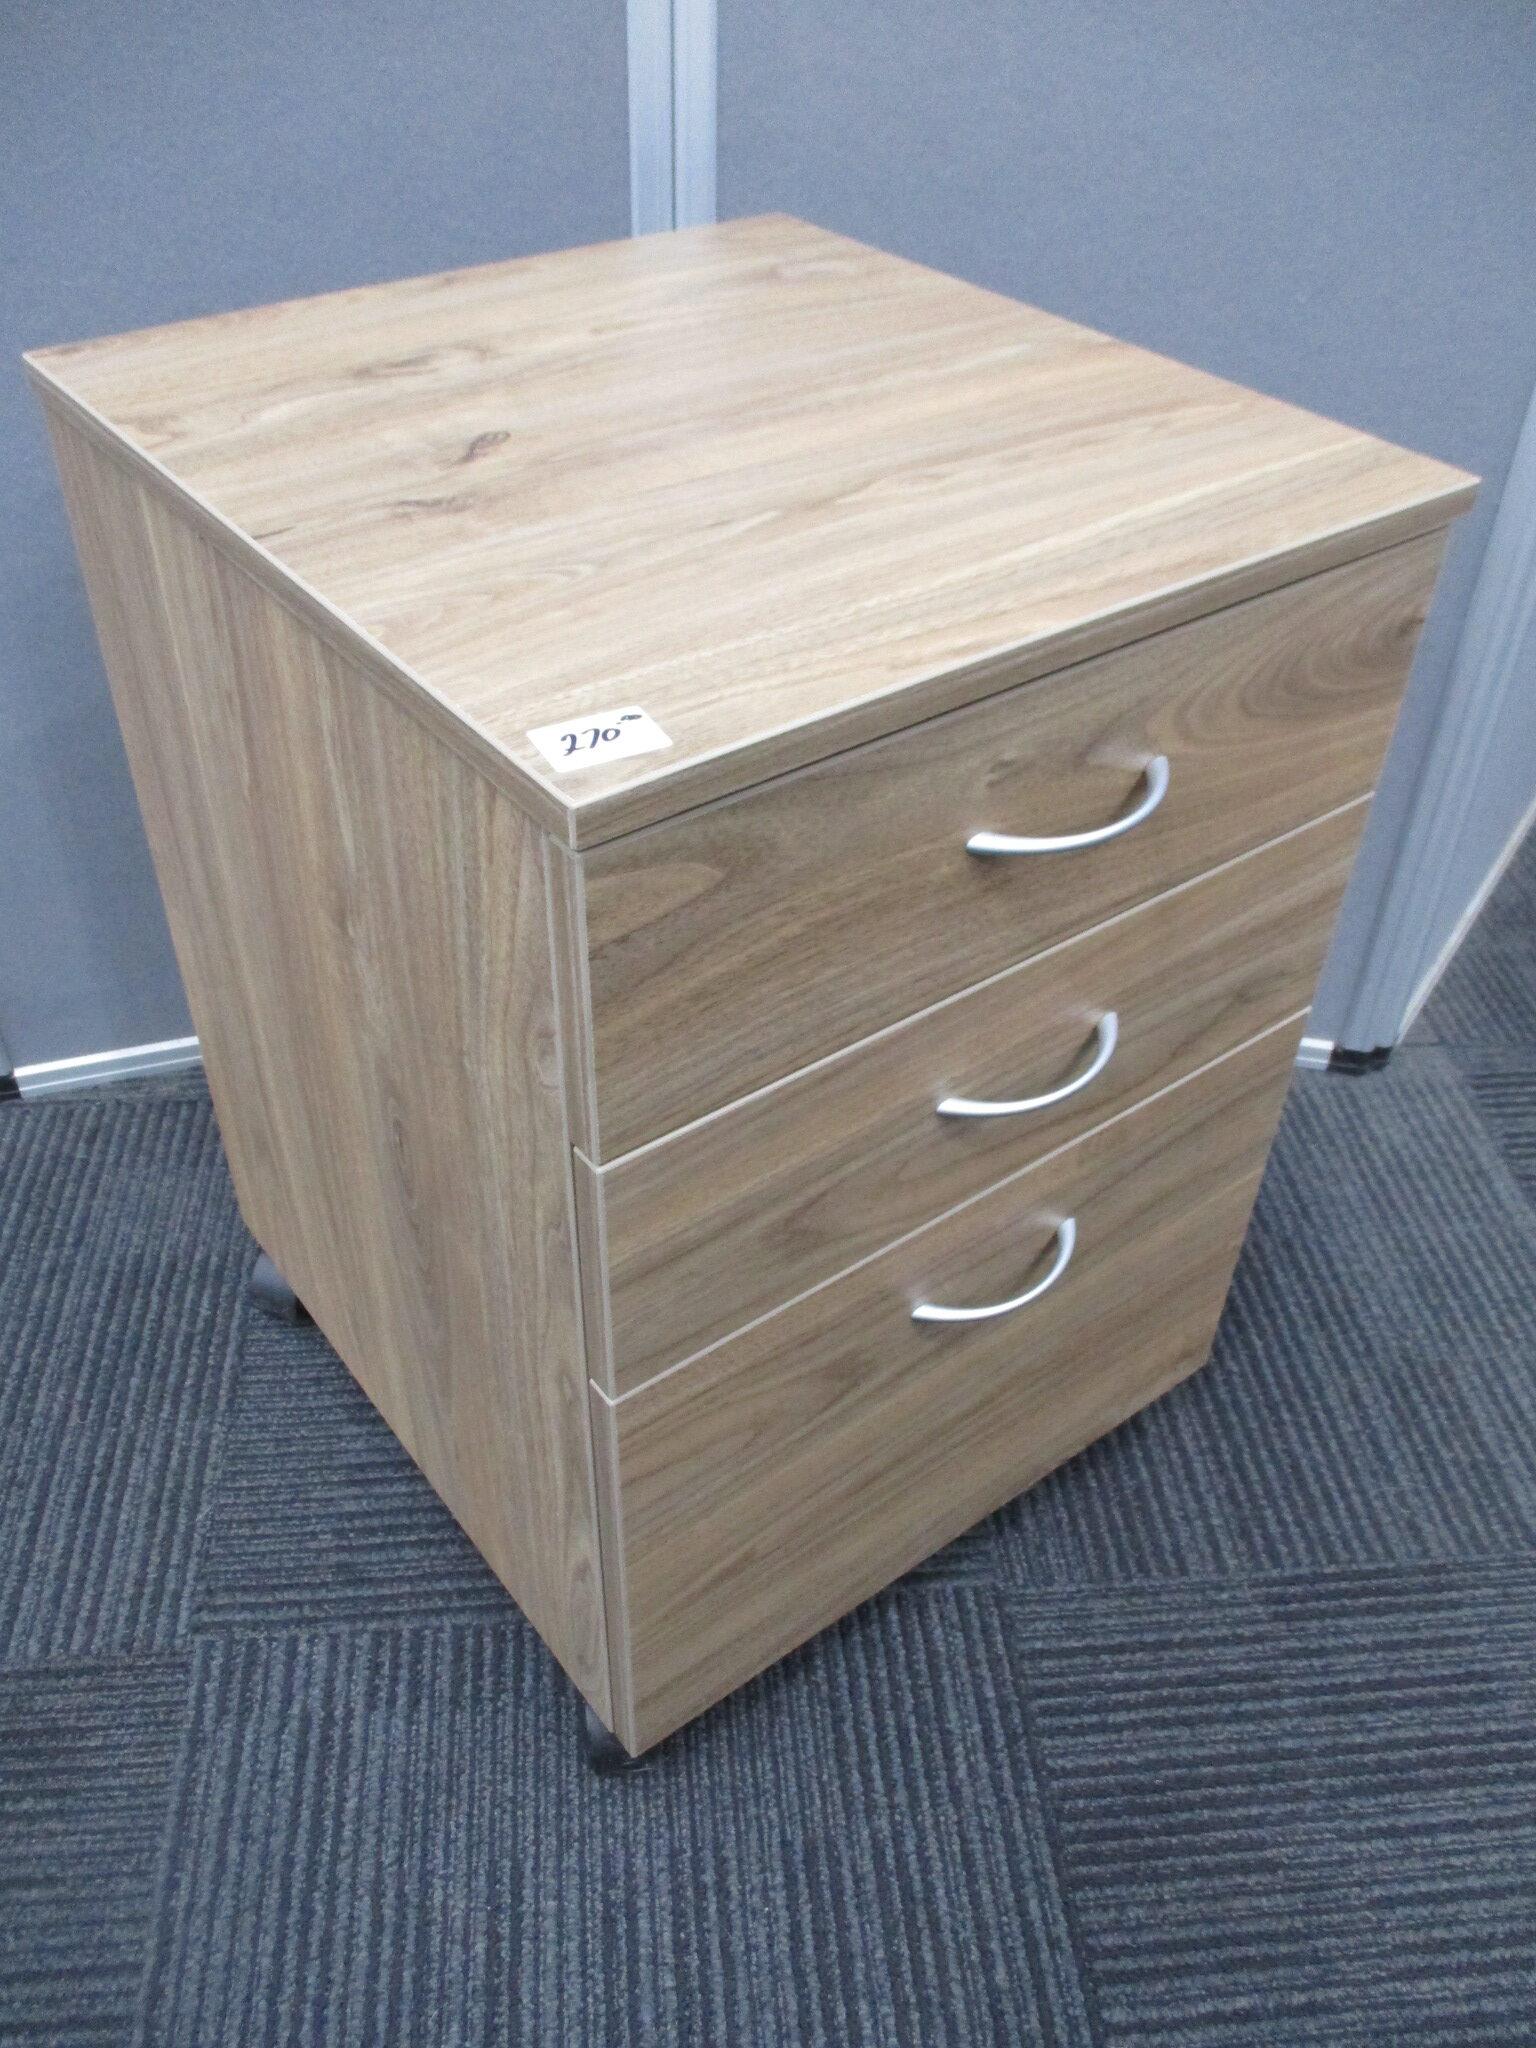 New Natural Walnut 3 Drawer Mobile Pedestals $270